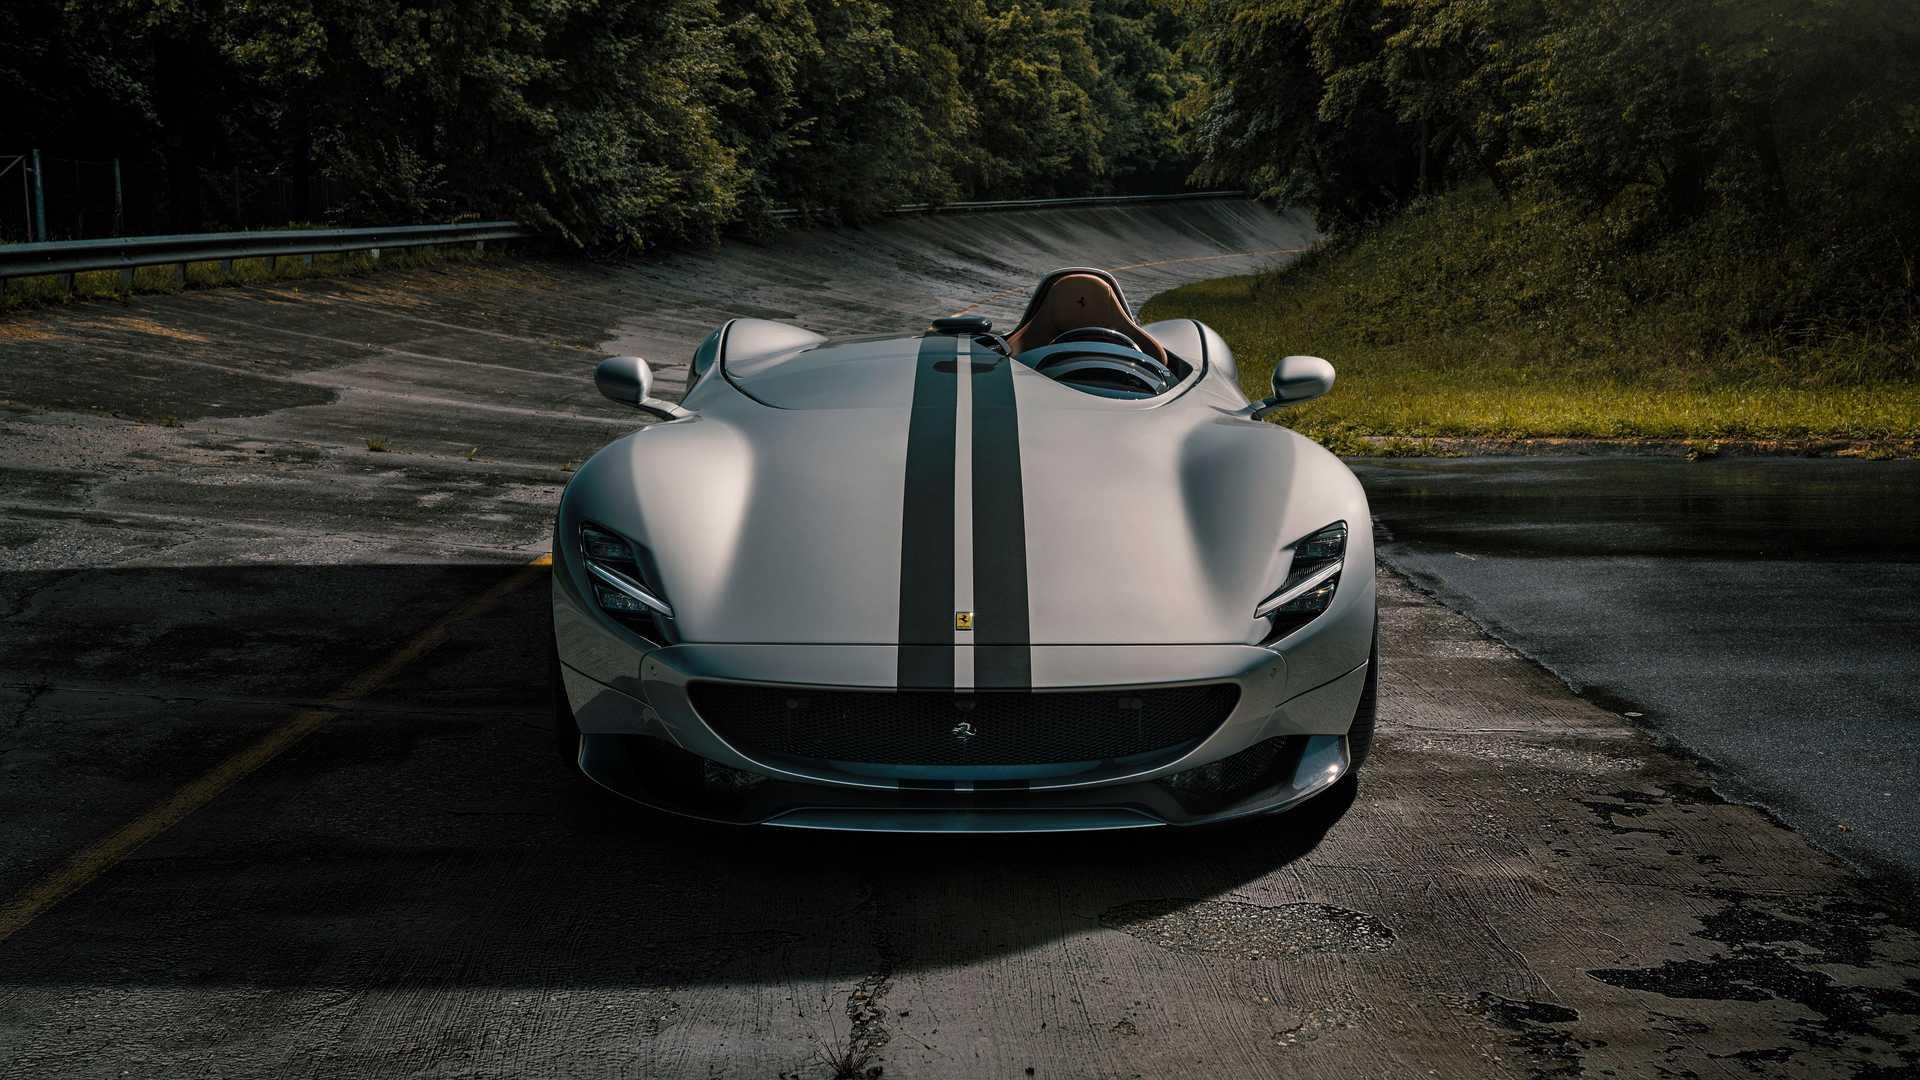 Ferrari_Monza_SP1_tuning_by_Novitec_0009